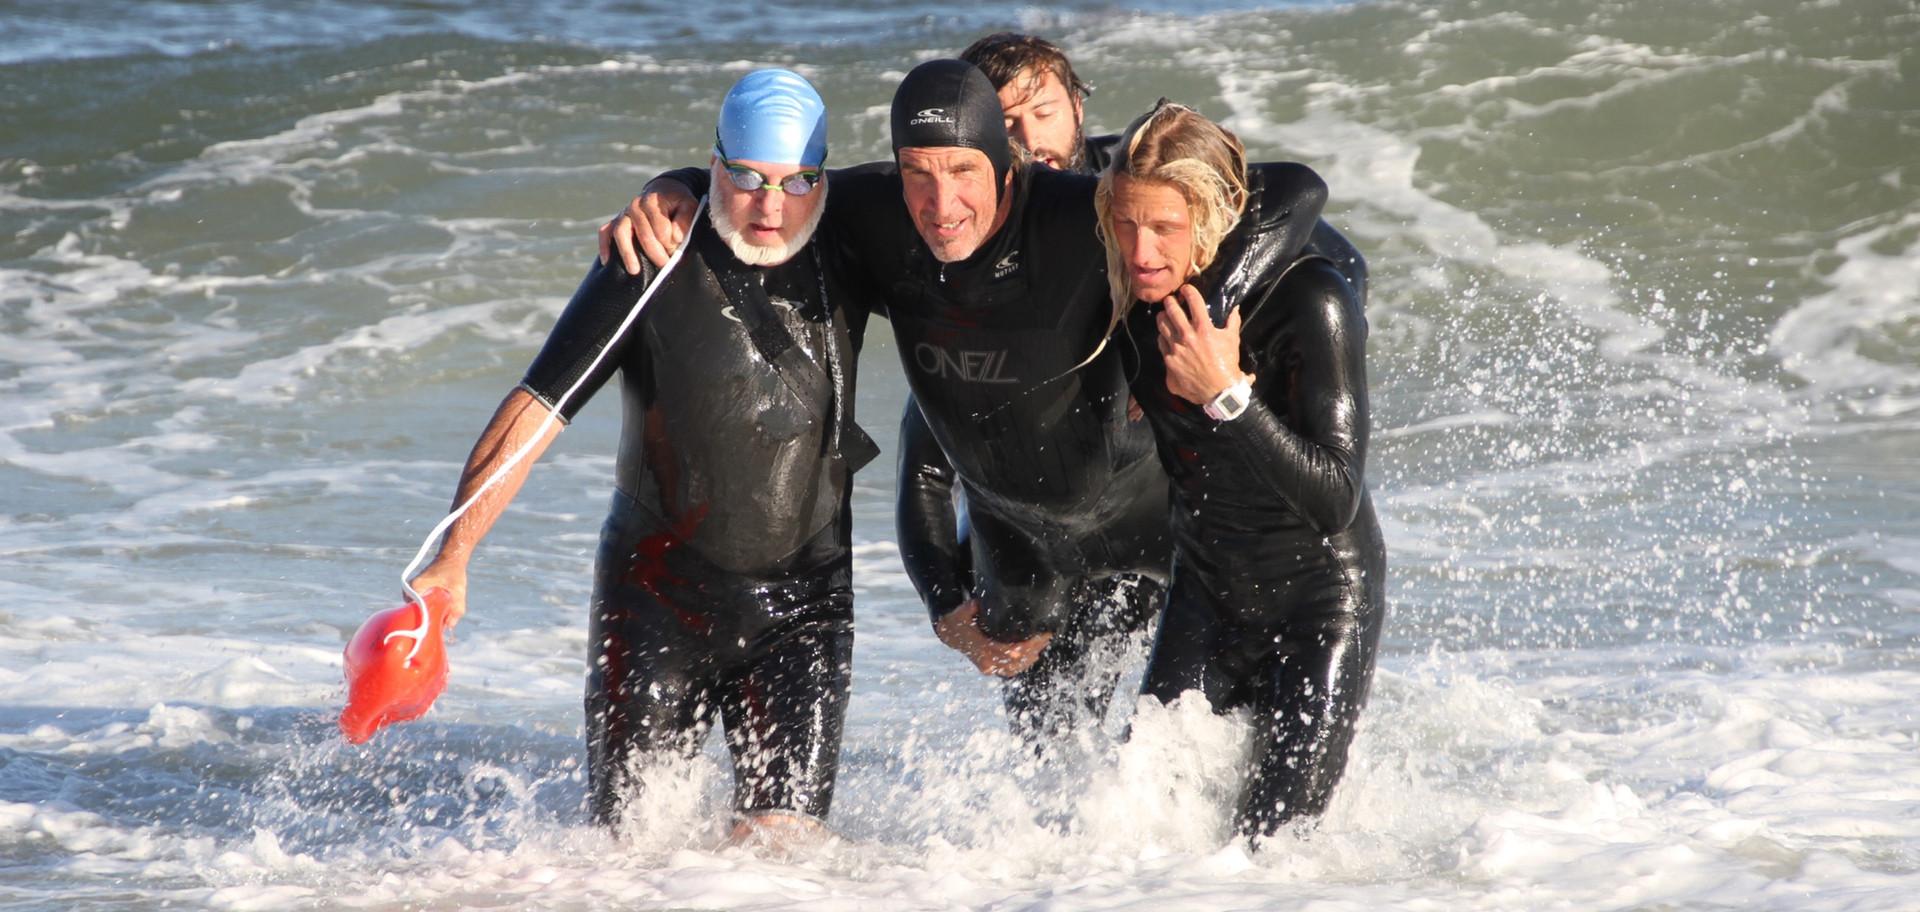 Southampton Village Ocean Rescue on call 24/7